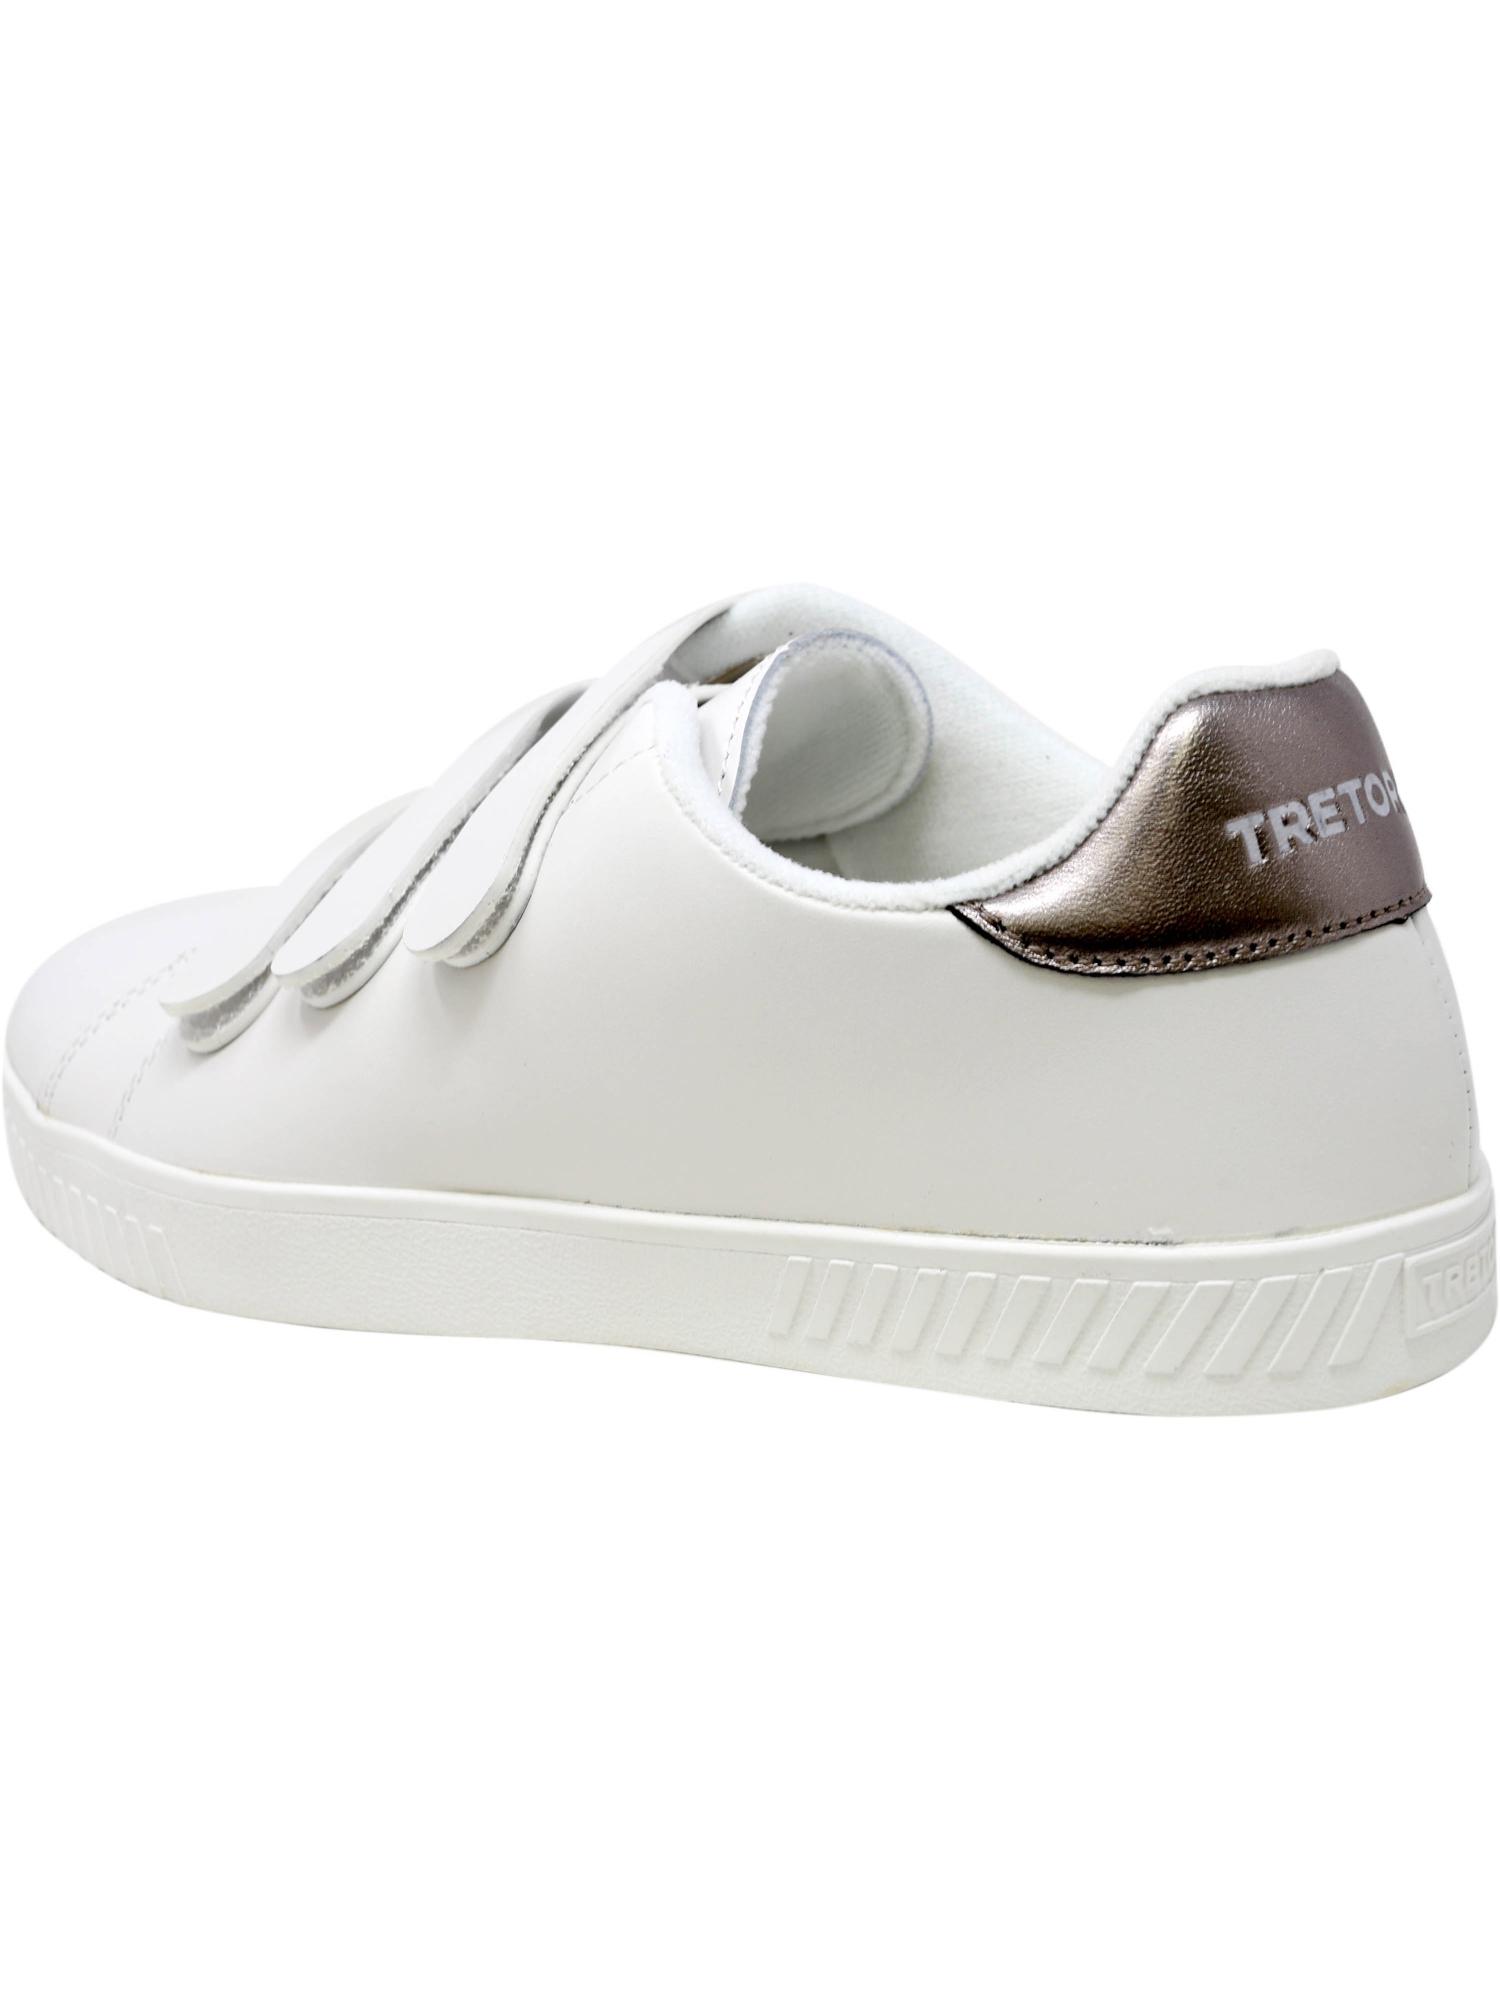 Homme-Tretorn-Transporter-2-en-Cuir-Cheville-High-Fashion-Sneaker miniature 12